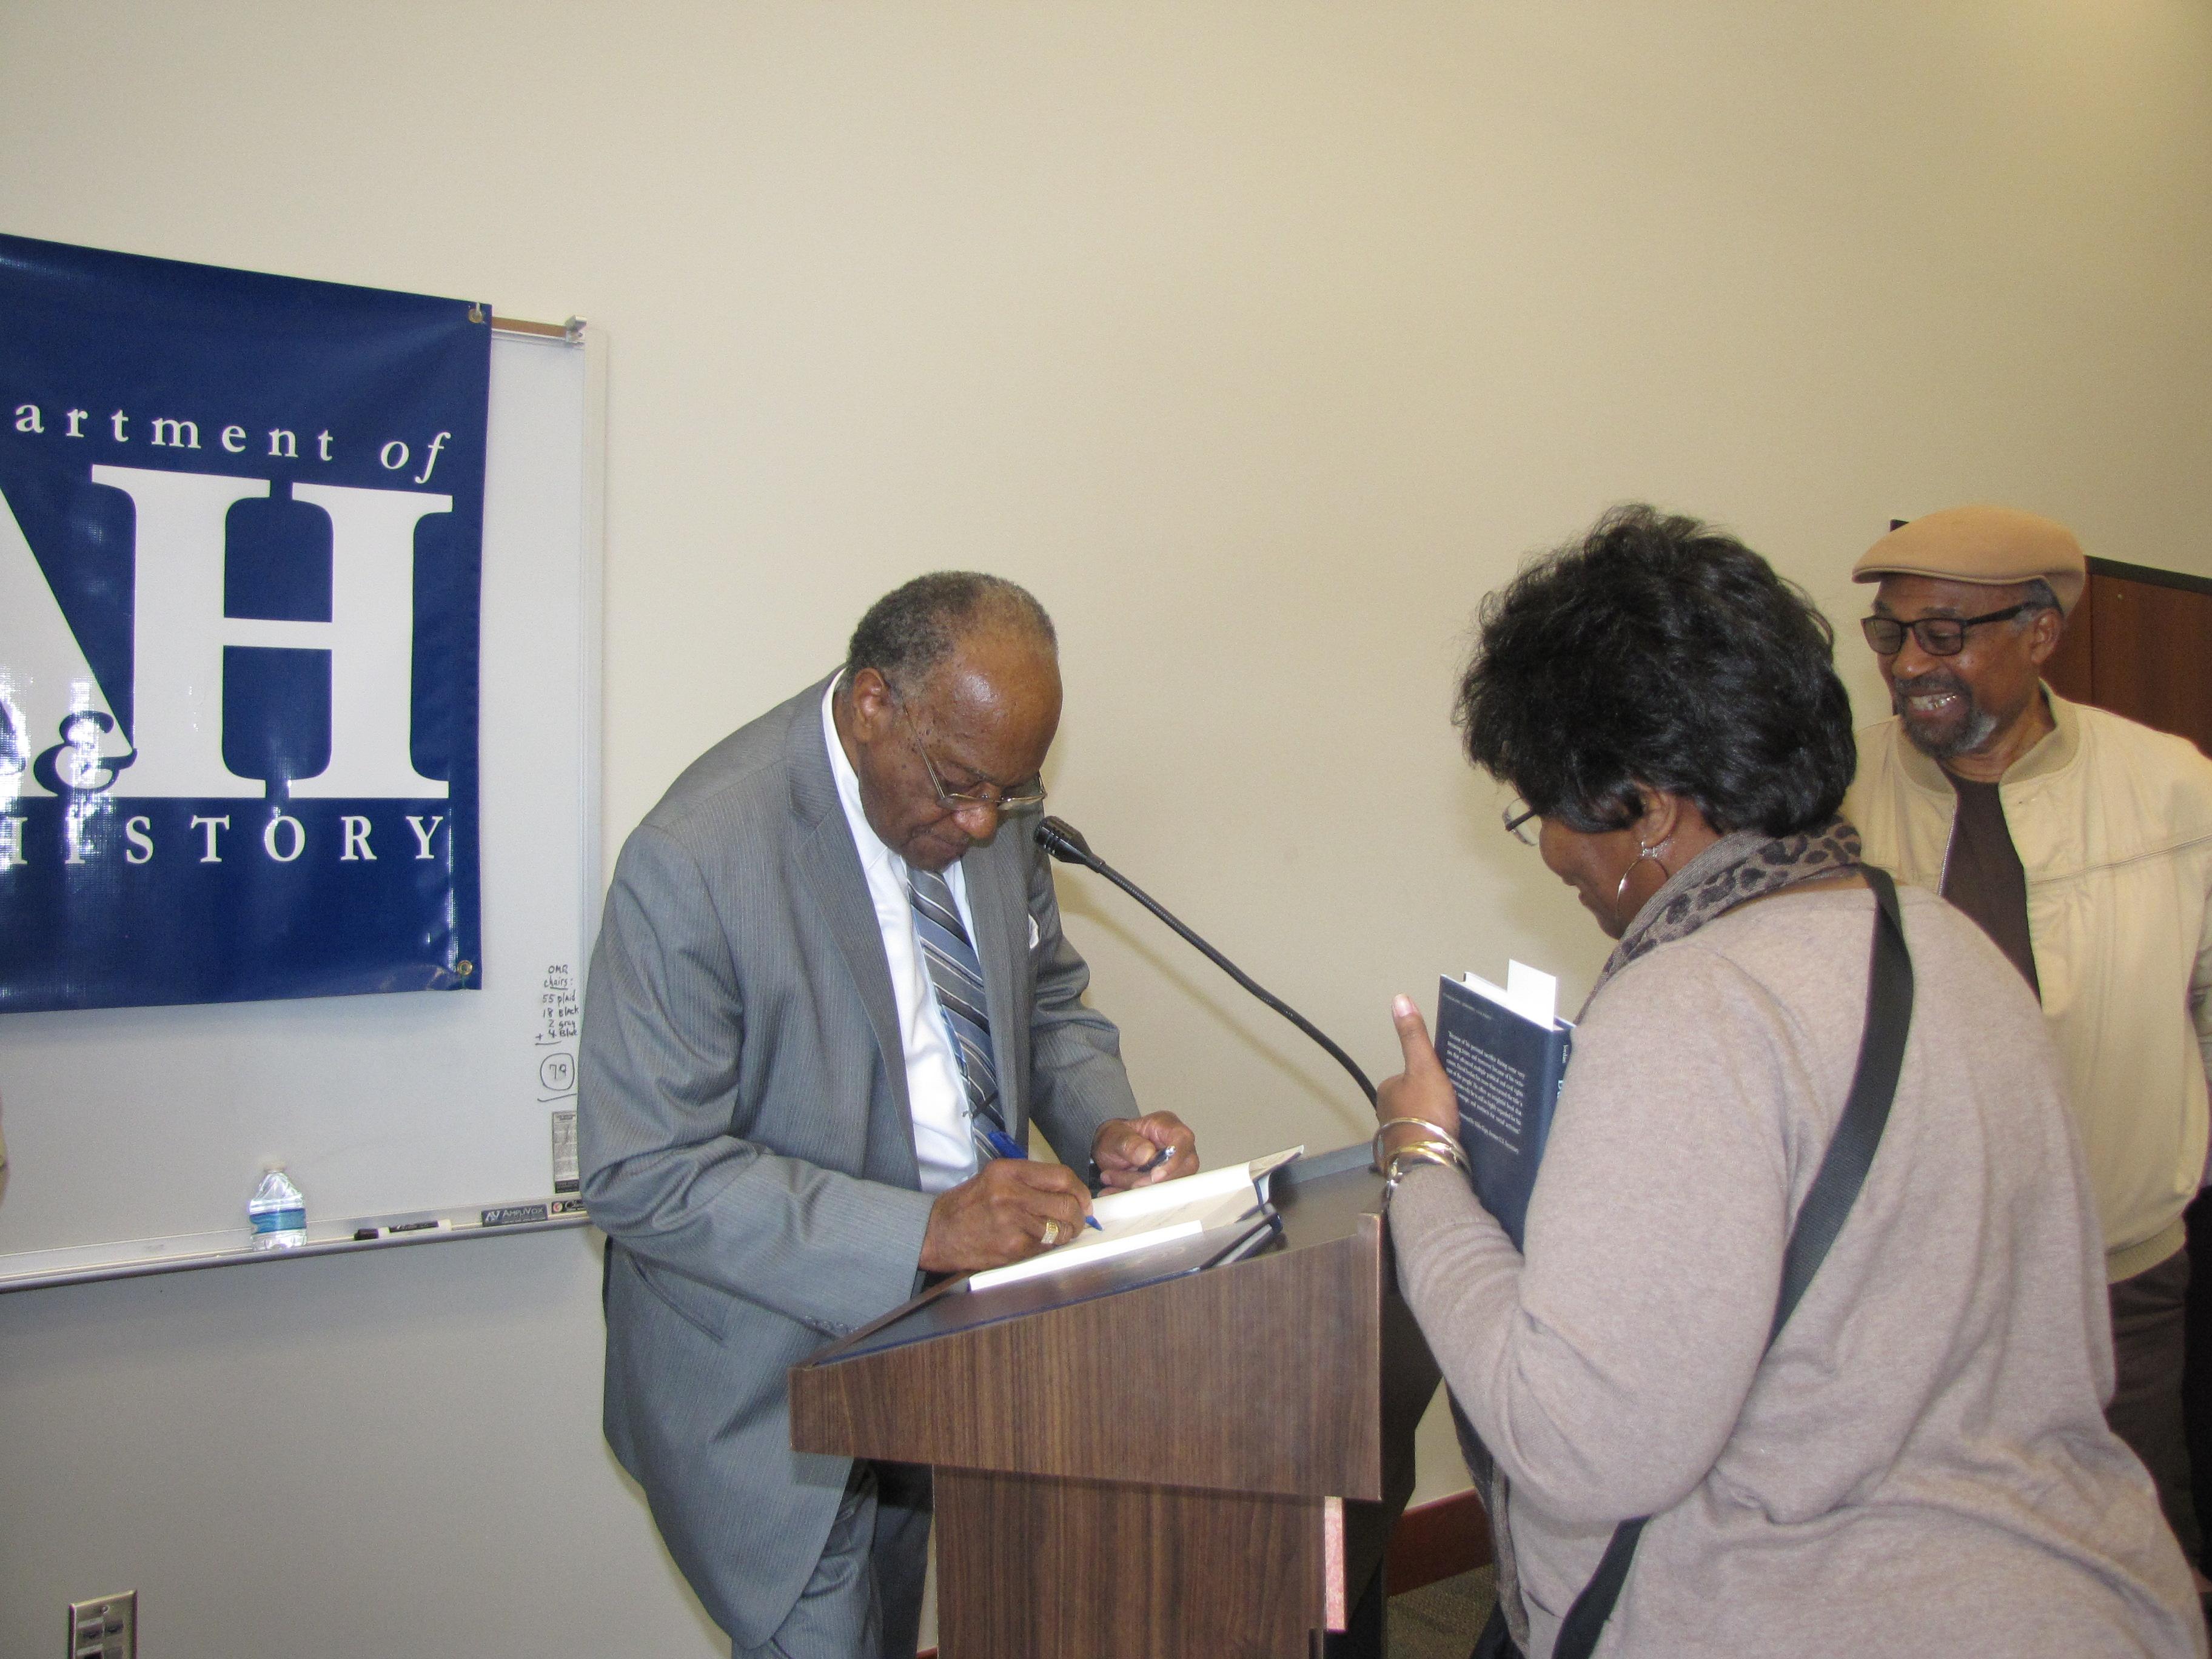 Sen. David Jordan signs book for attender. Photo by Janice K. Neal-Vincent